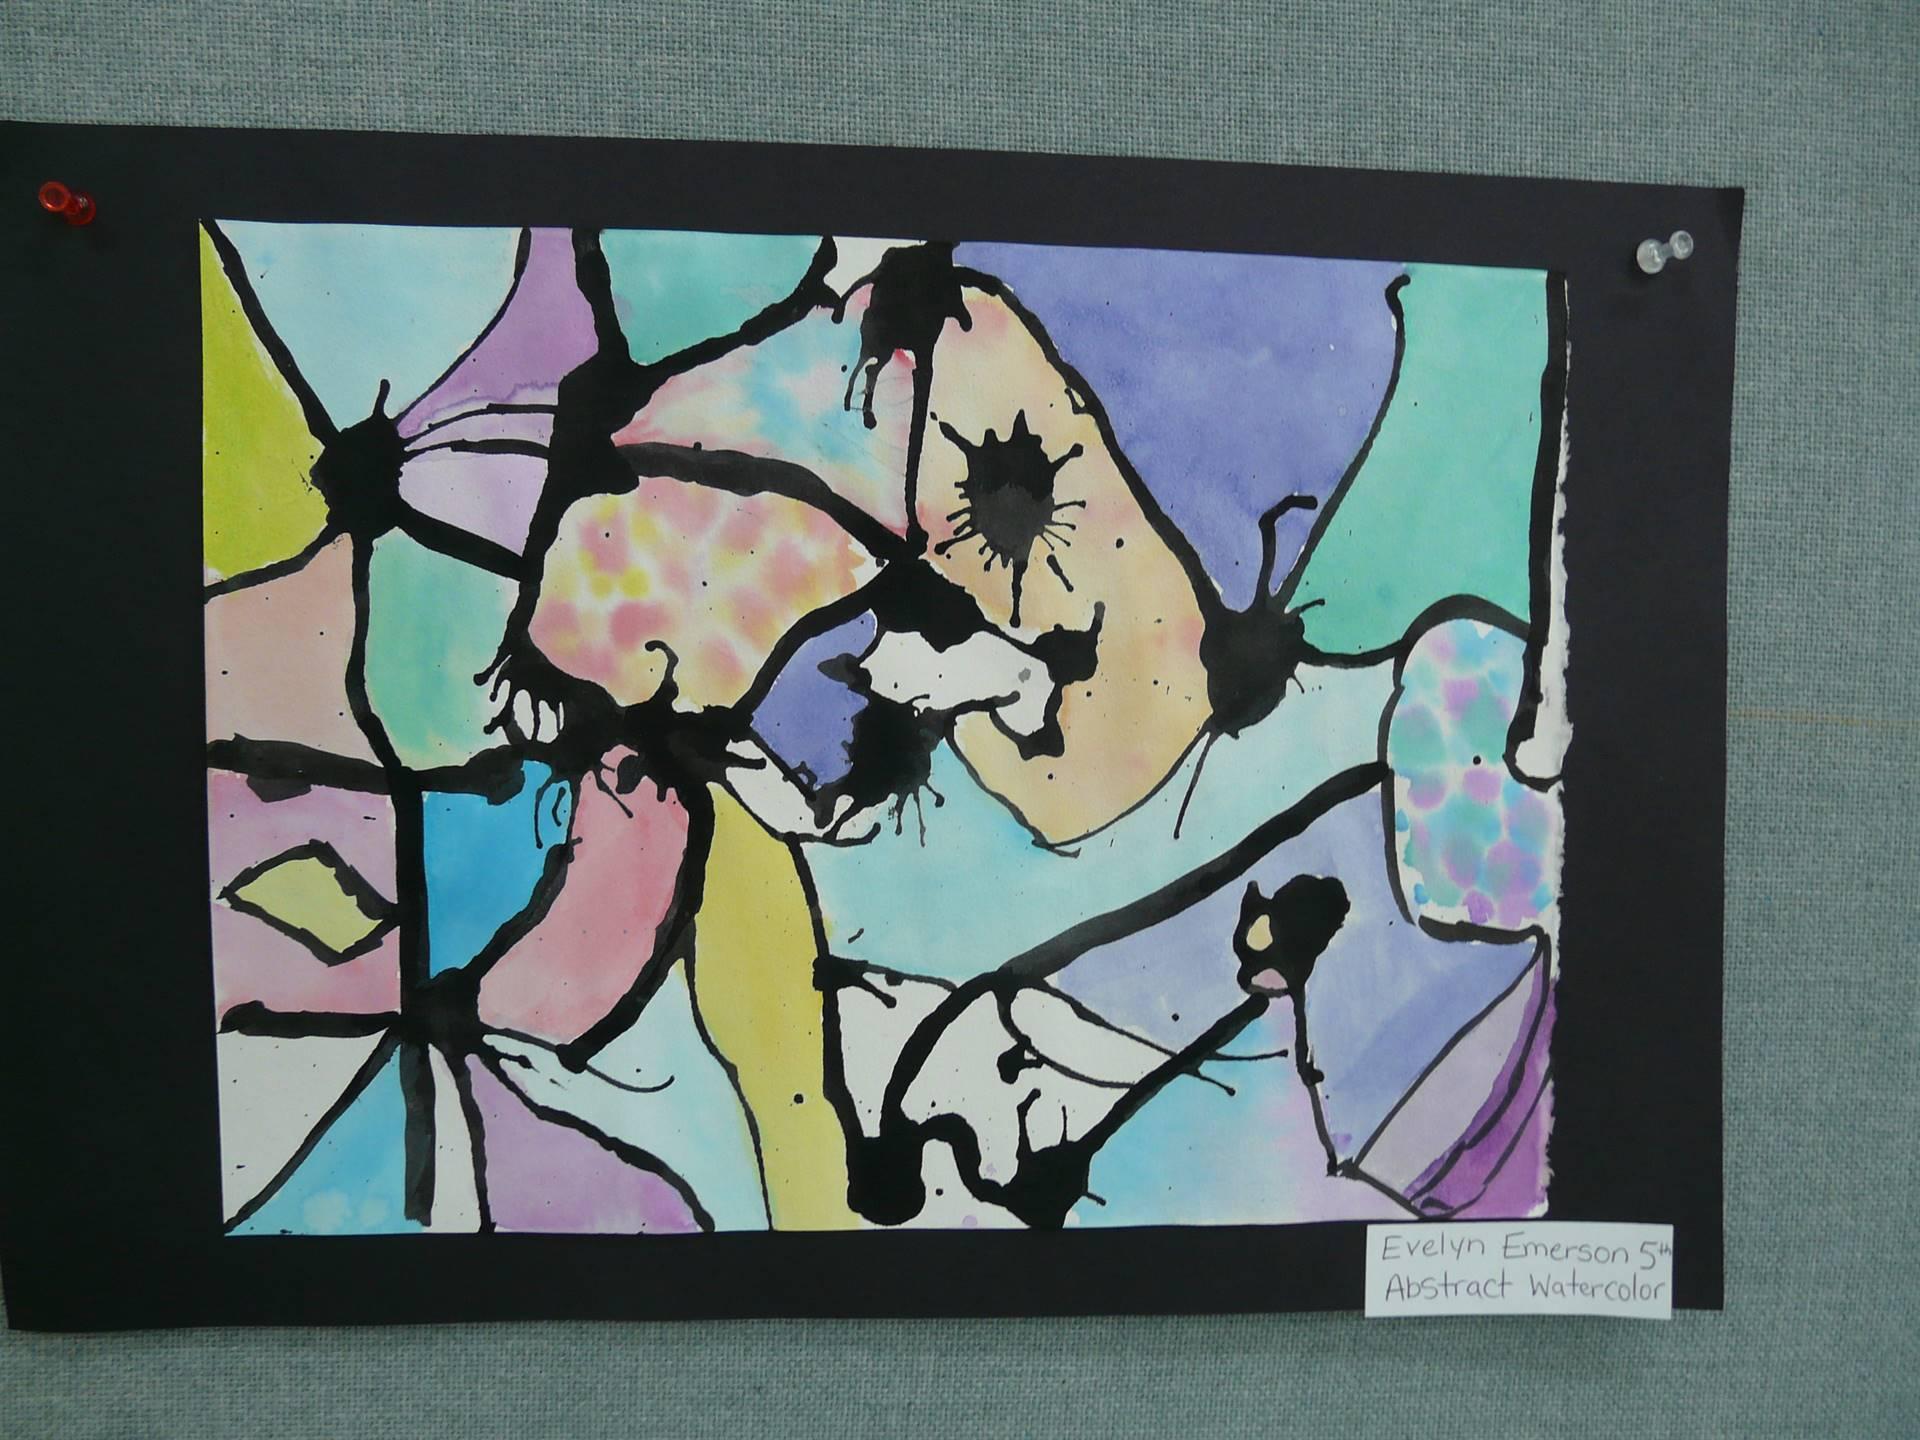 abstract art, pink, yellow, purple, light green